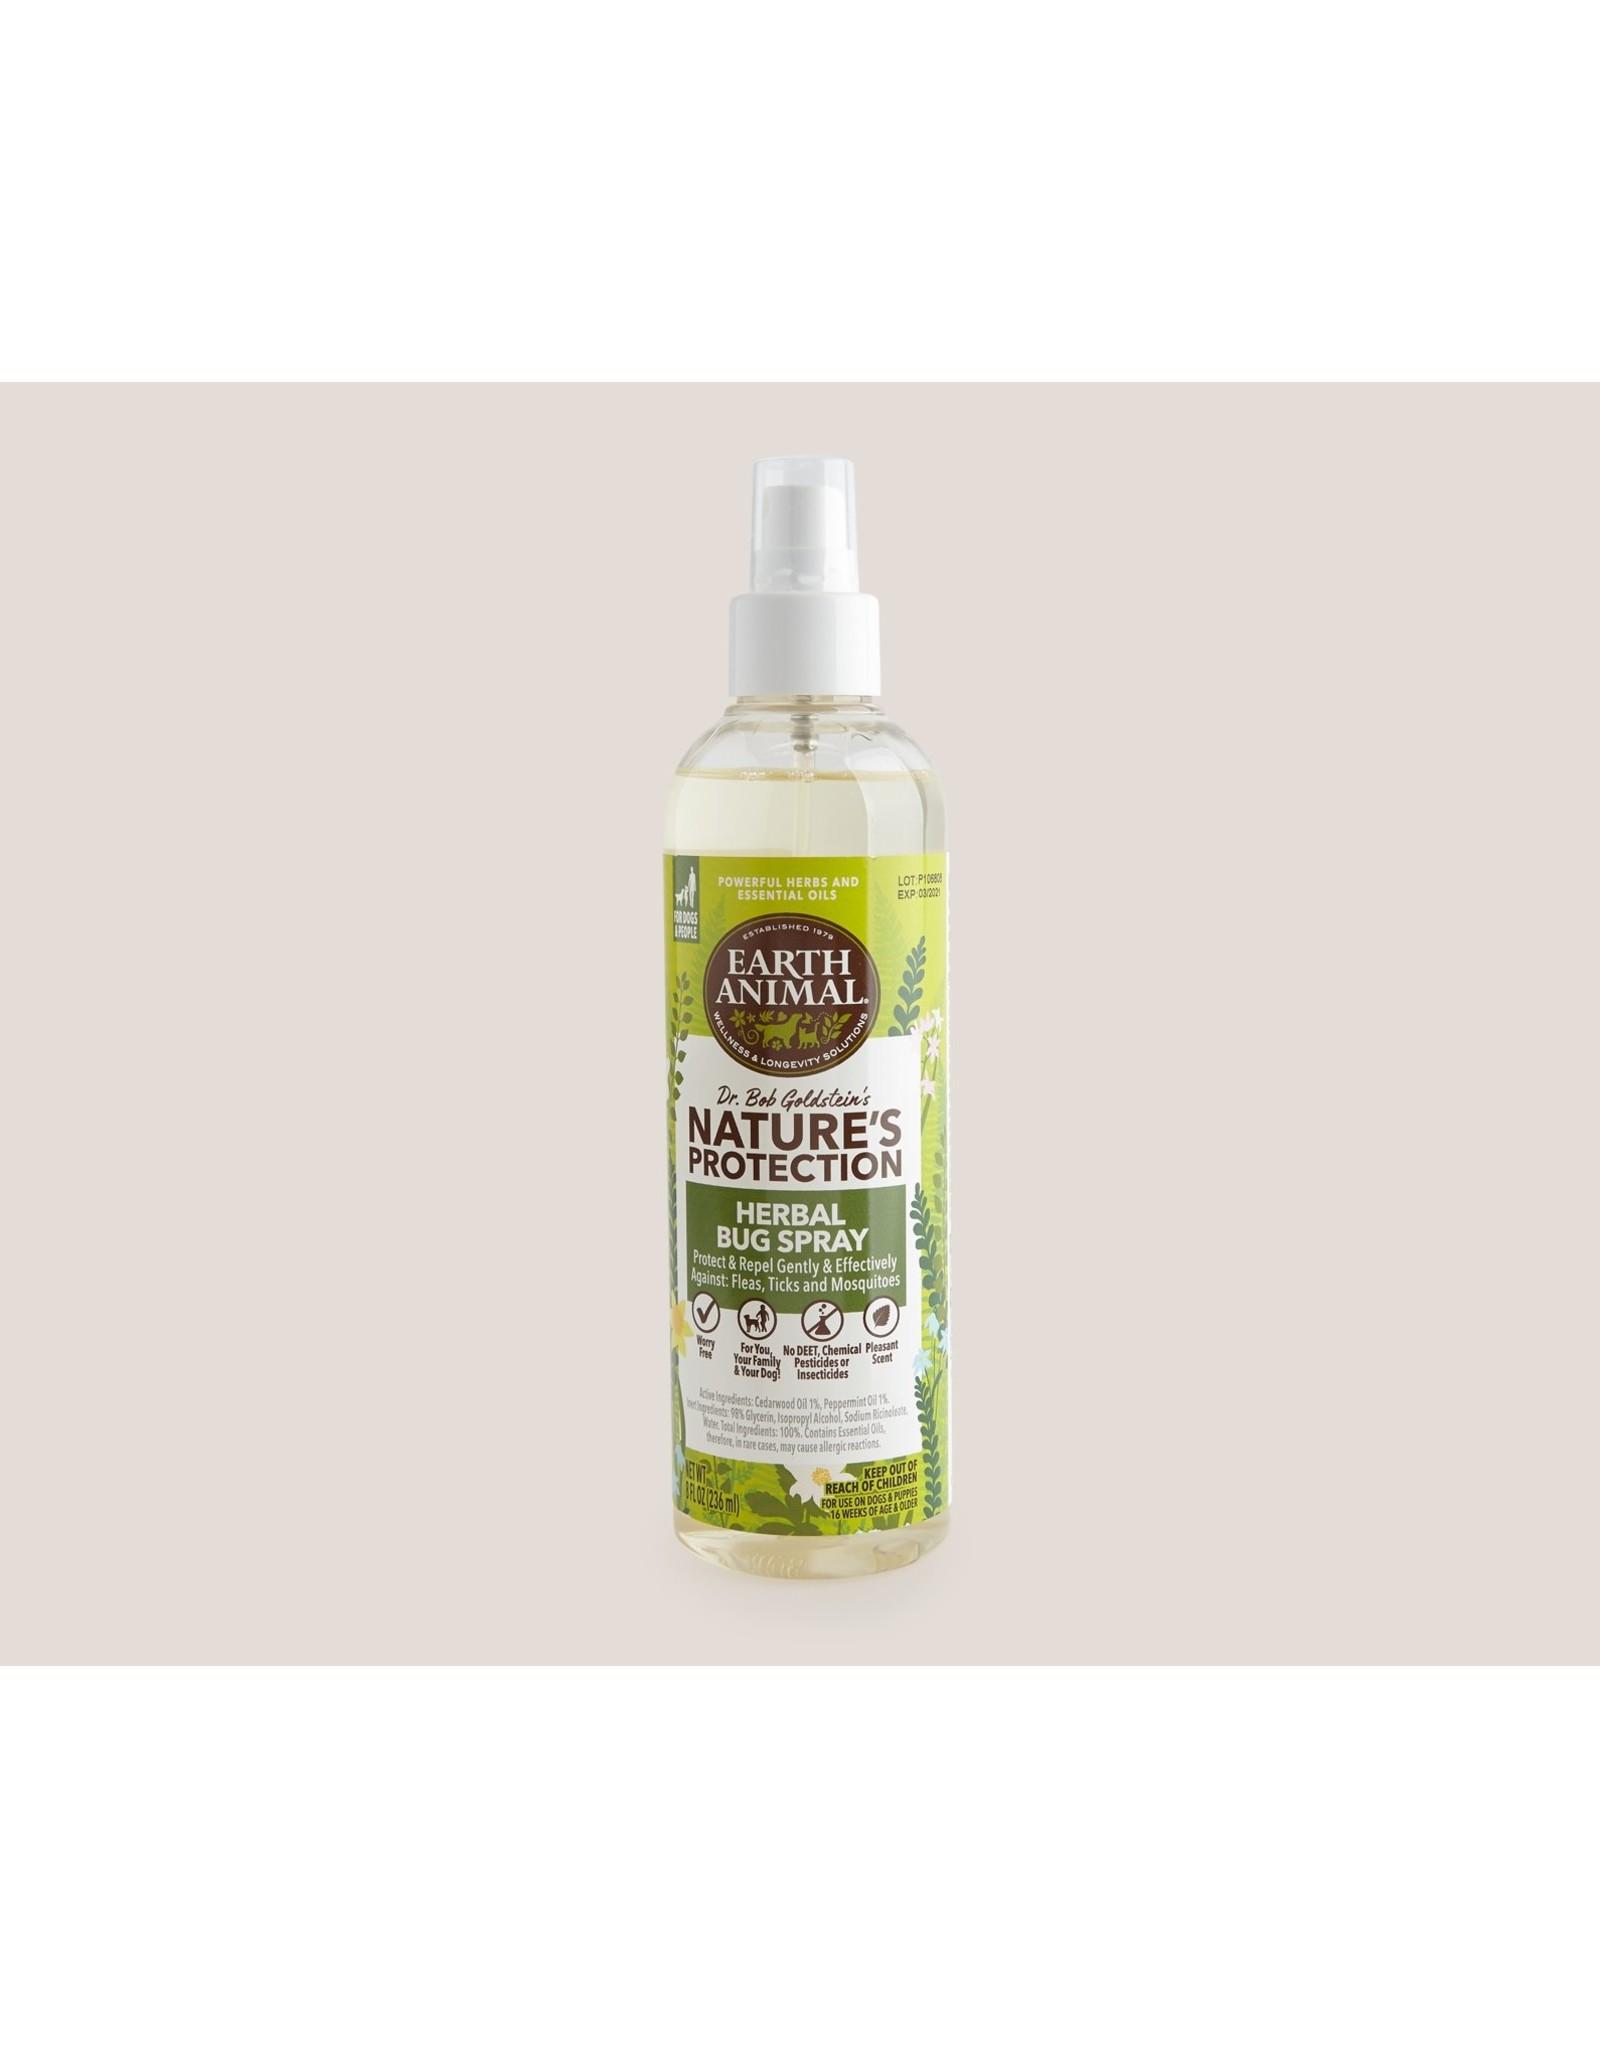 Earth Animal Earth Animal Herbal Bug Spray